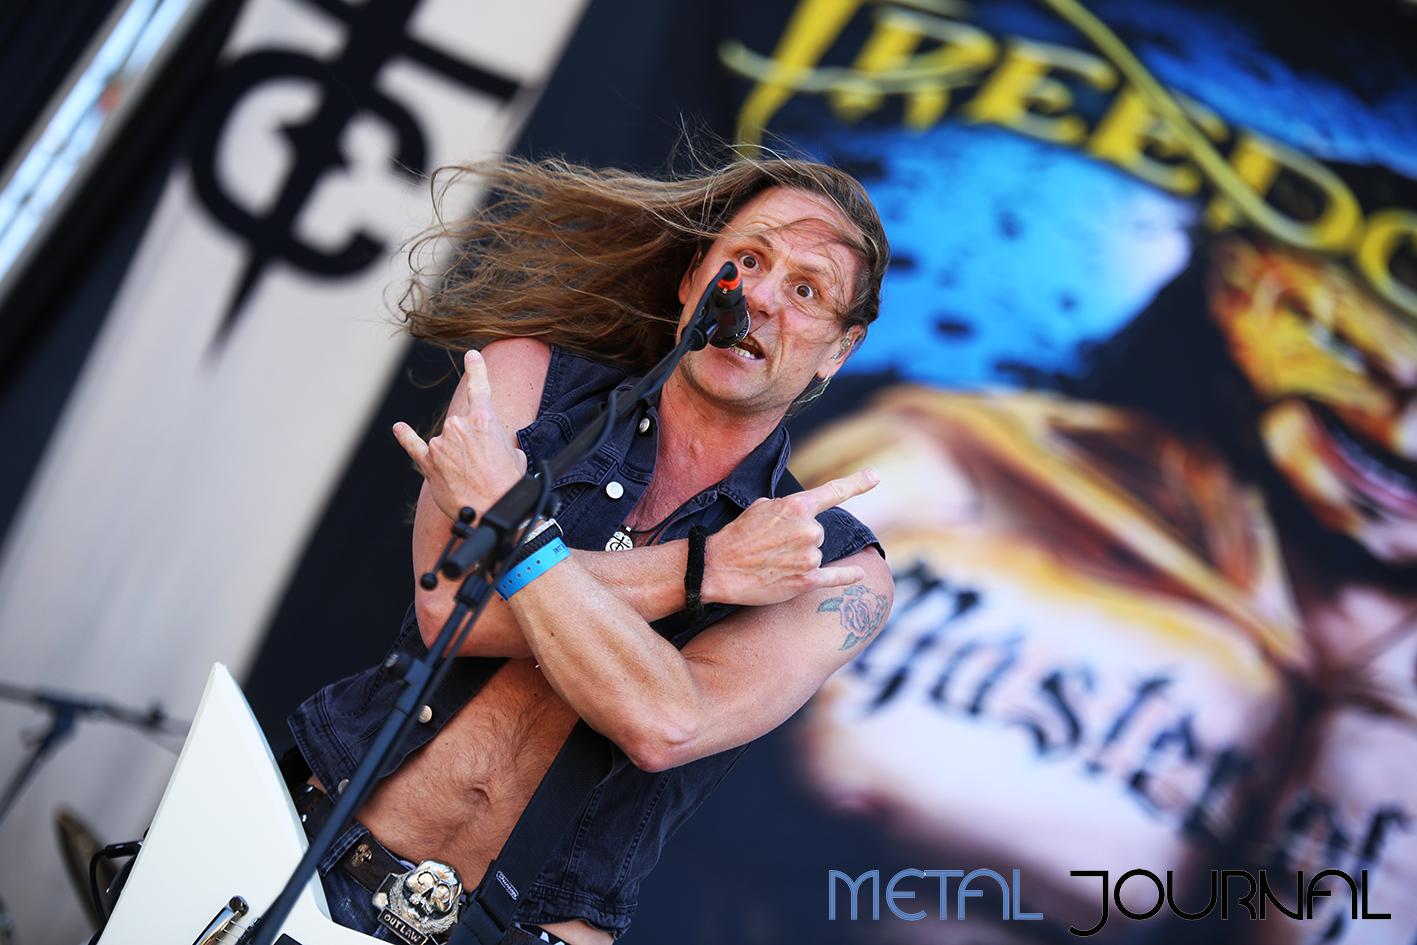 freedom call metal journal rock the coast 2019 pic 4